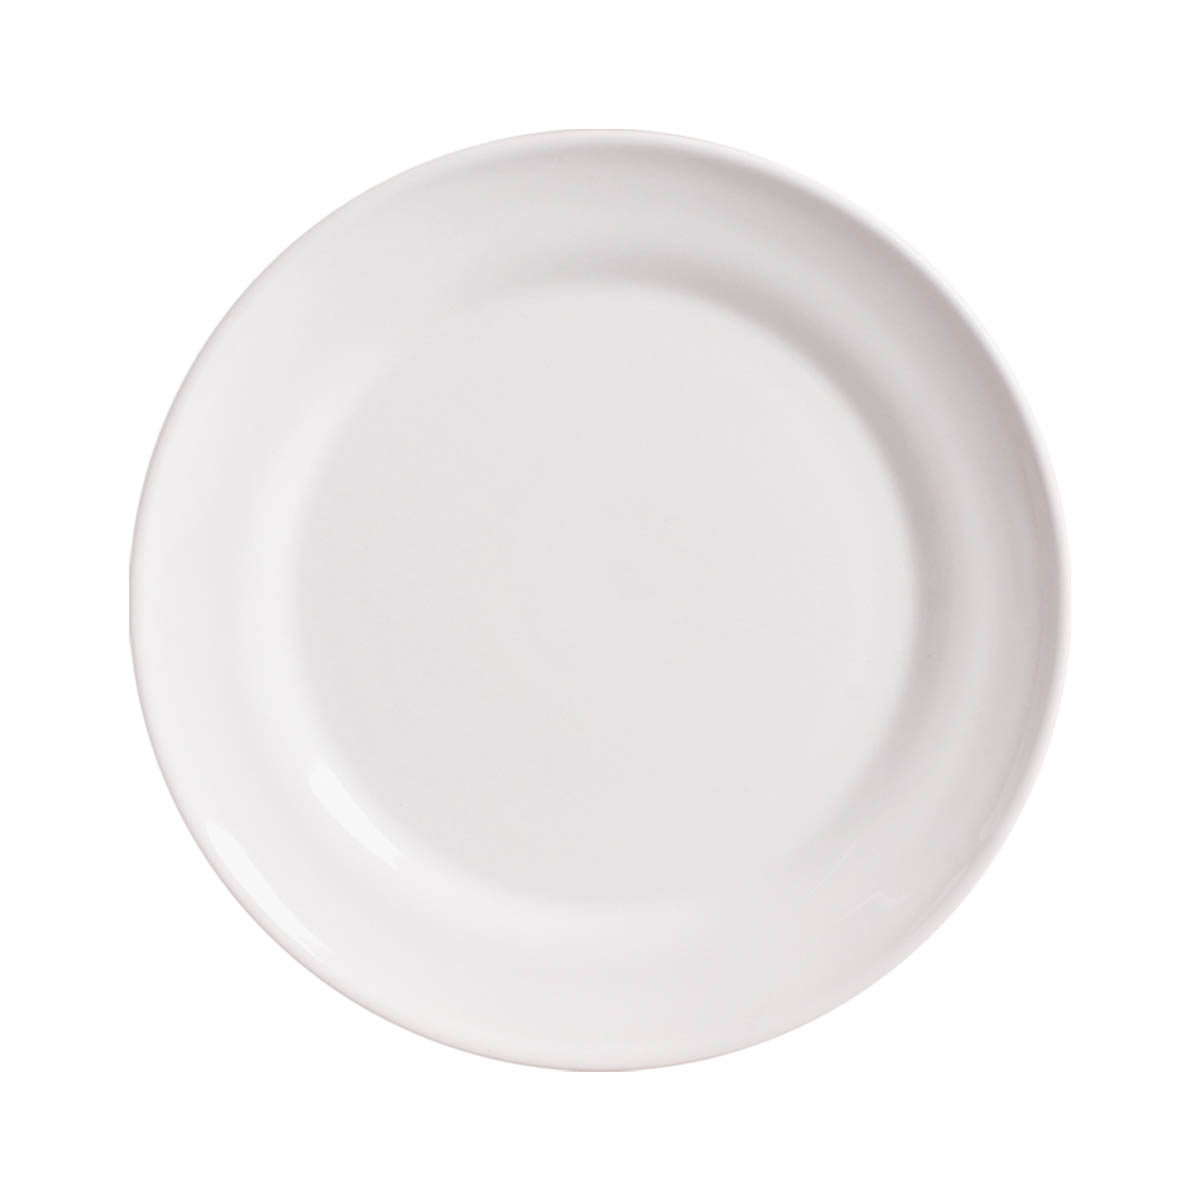 Prato Raso Requinte Lisa Branco Clássico